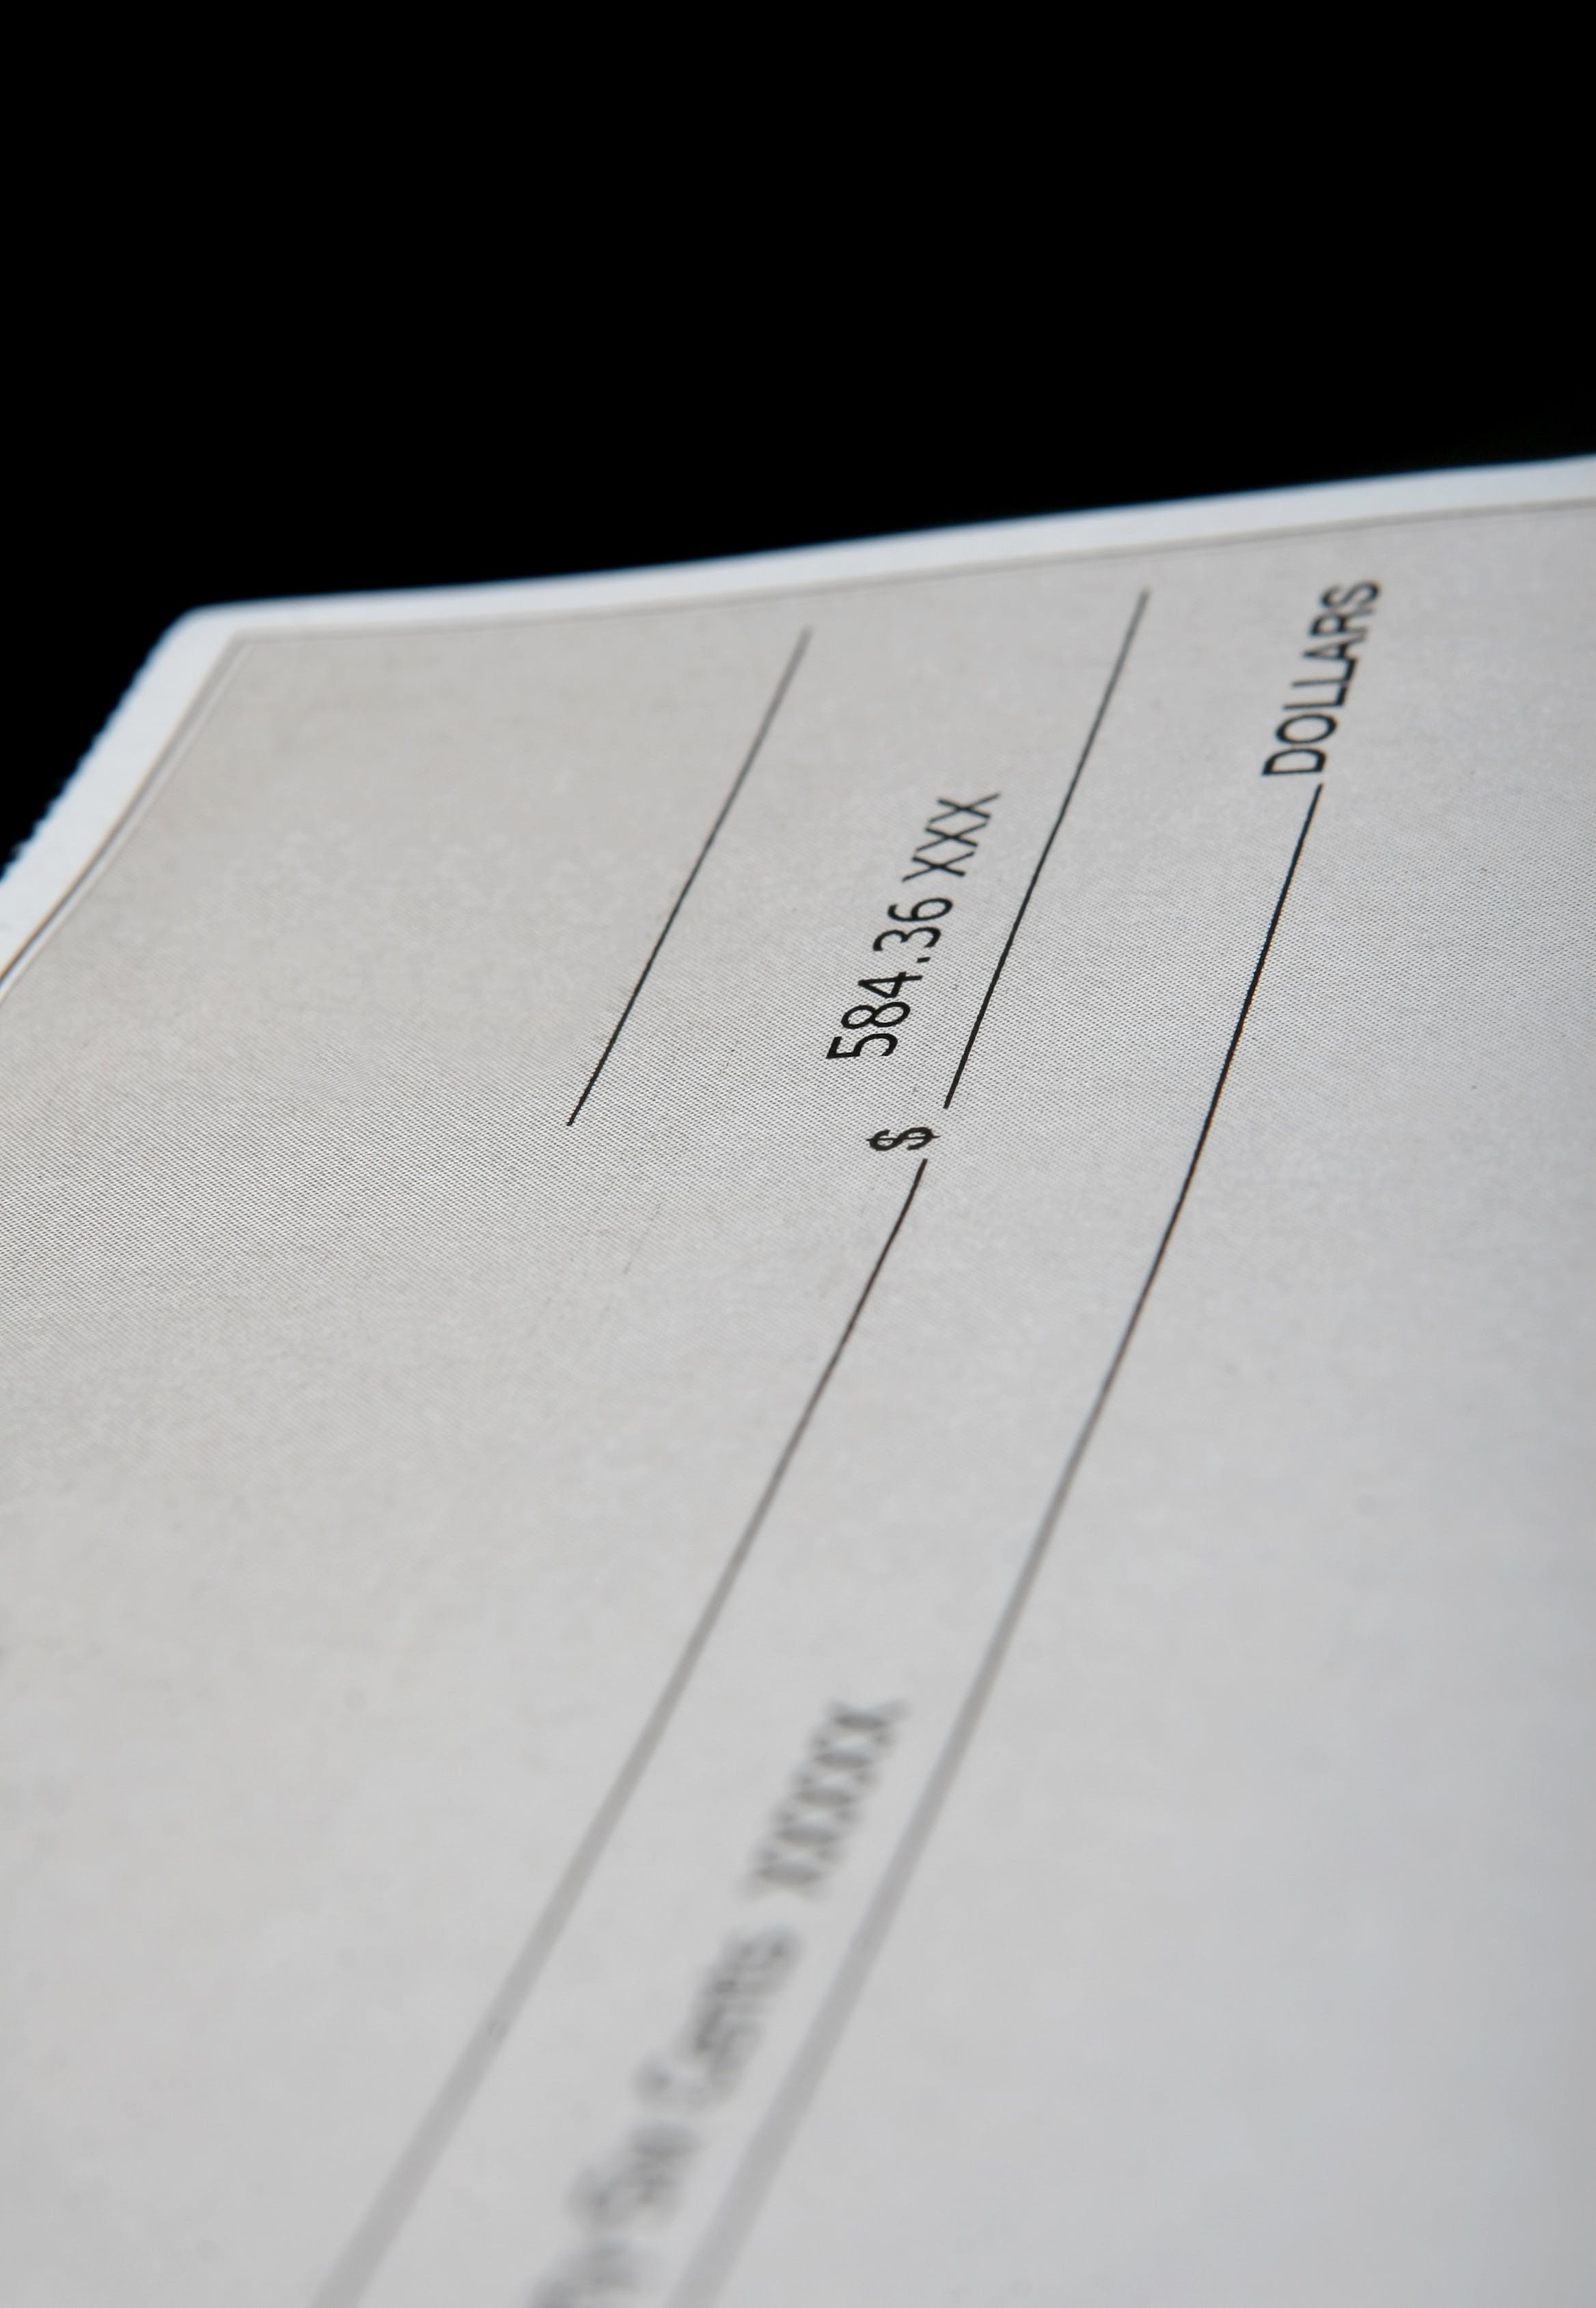 584.36 Paycheck